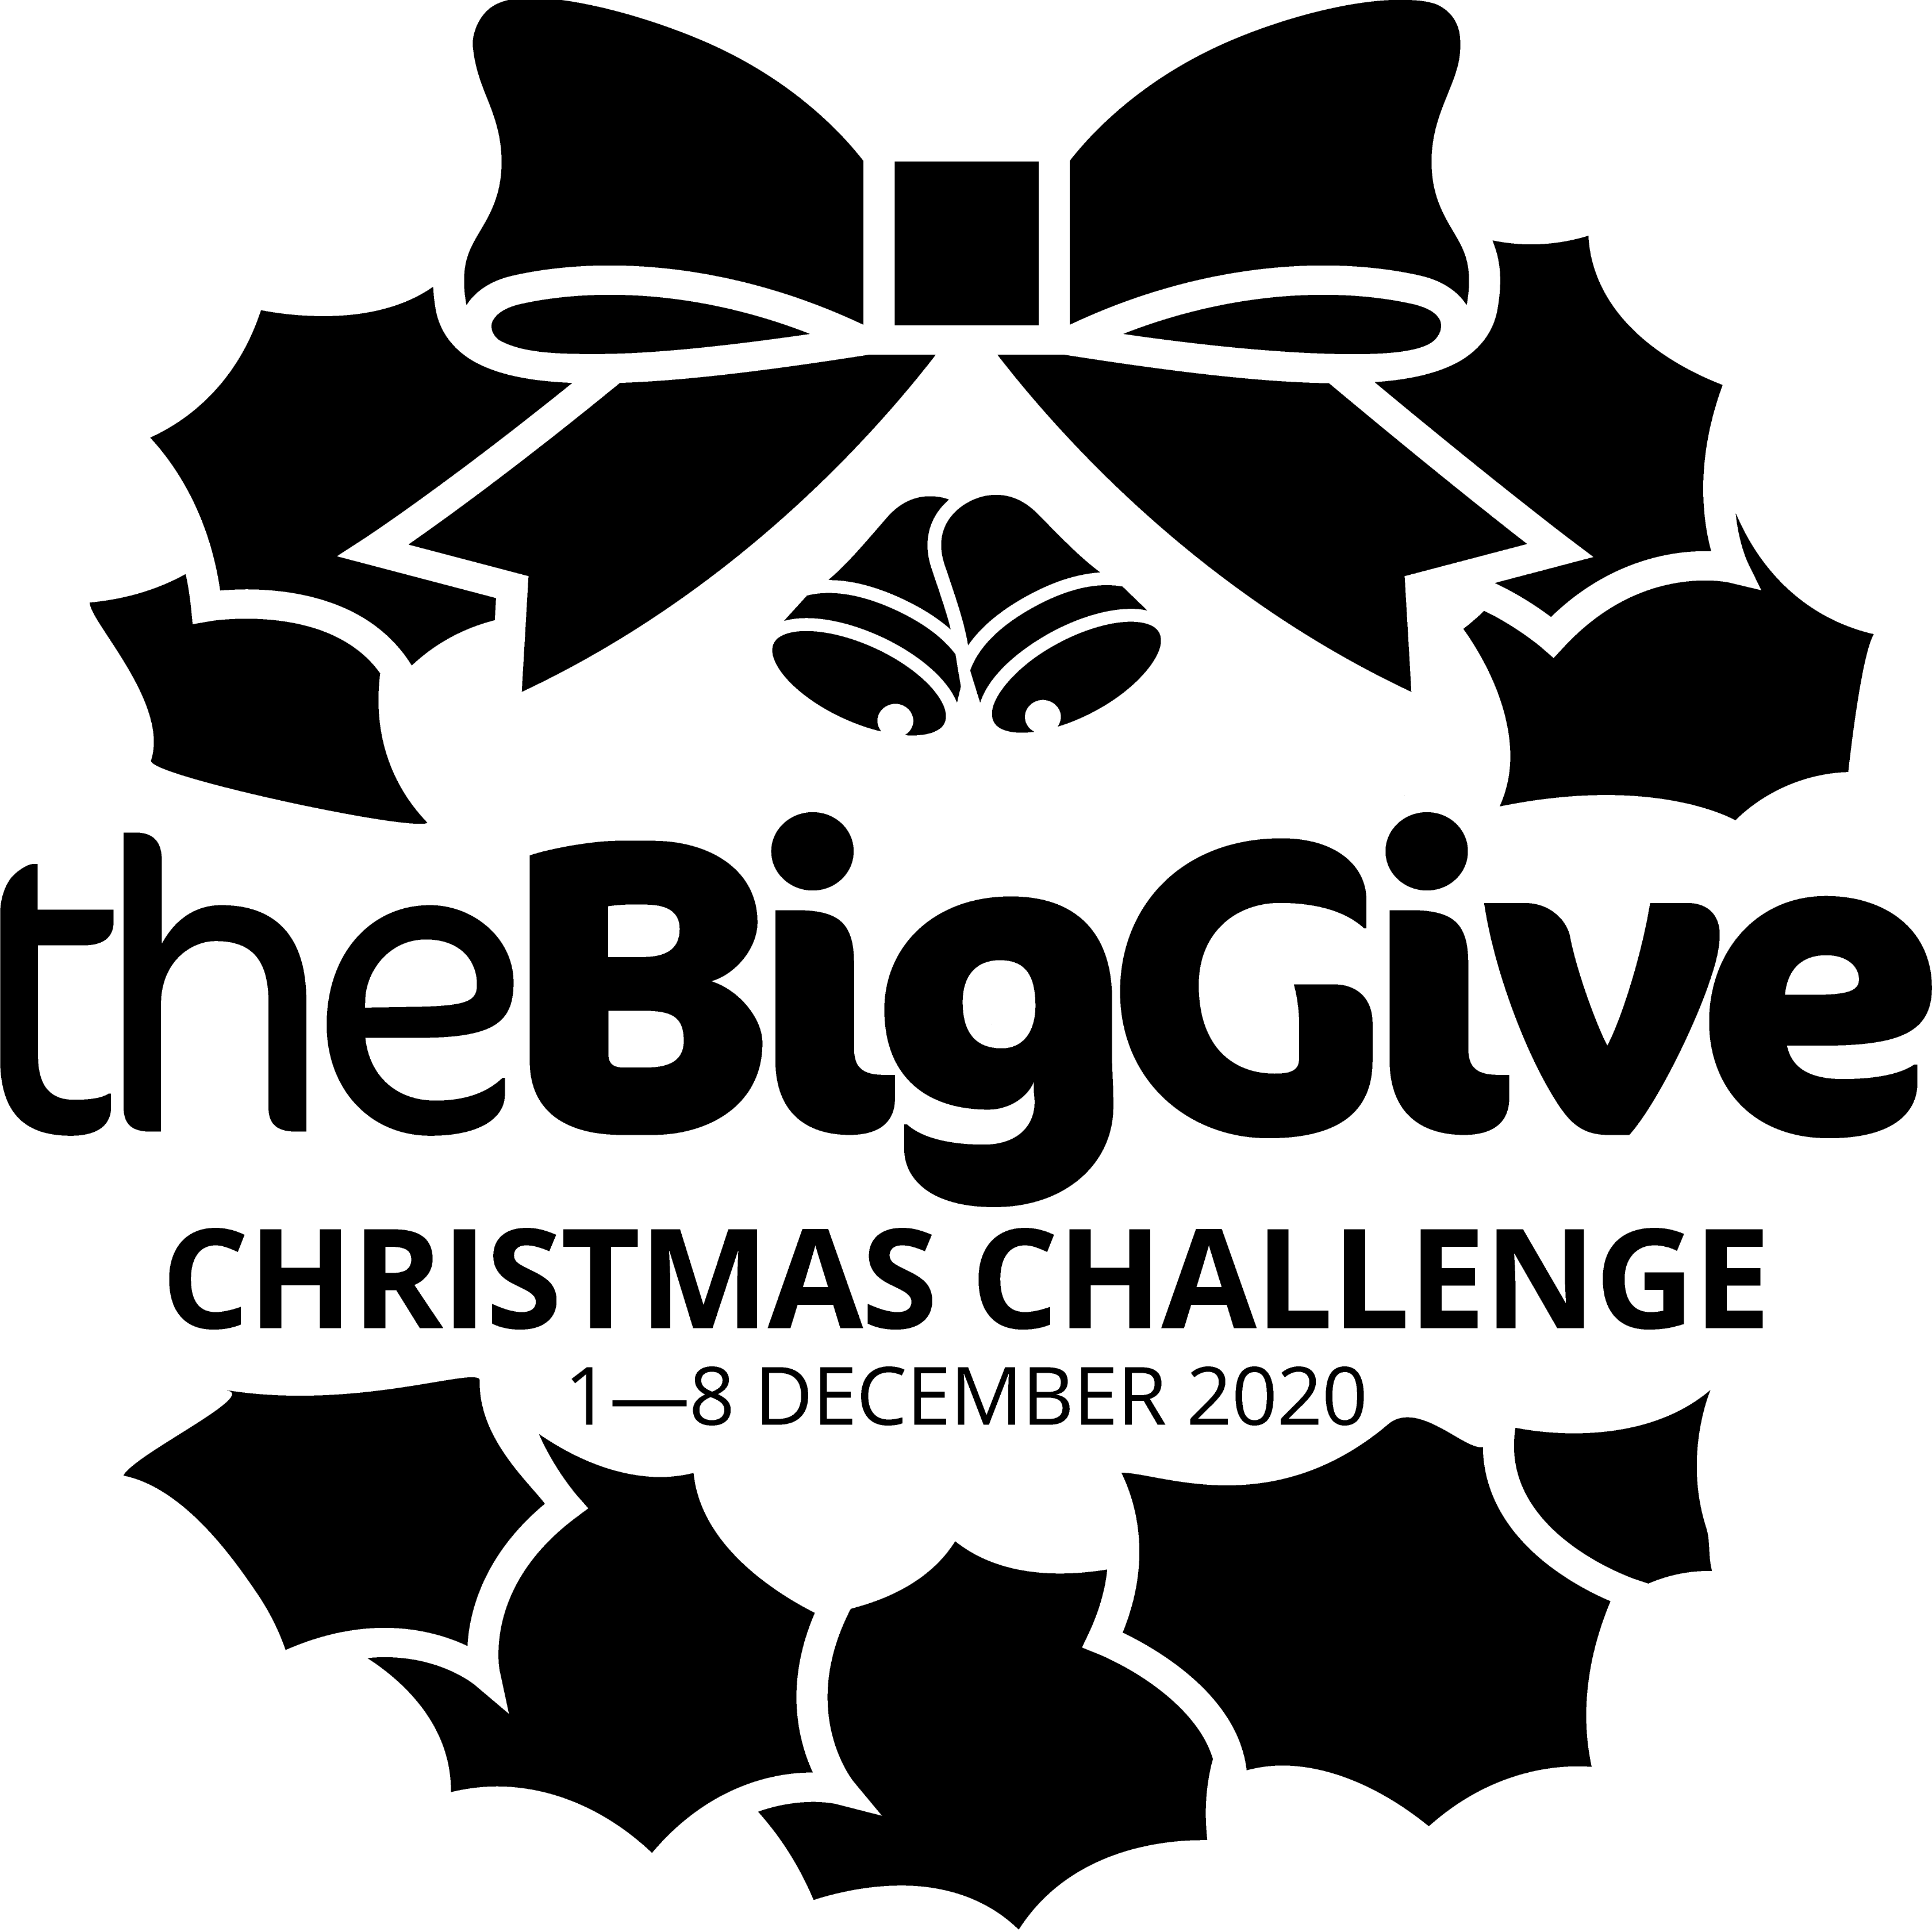 TBG Logo Square Black Details